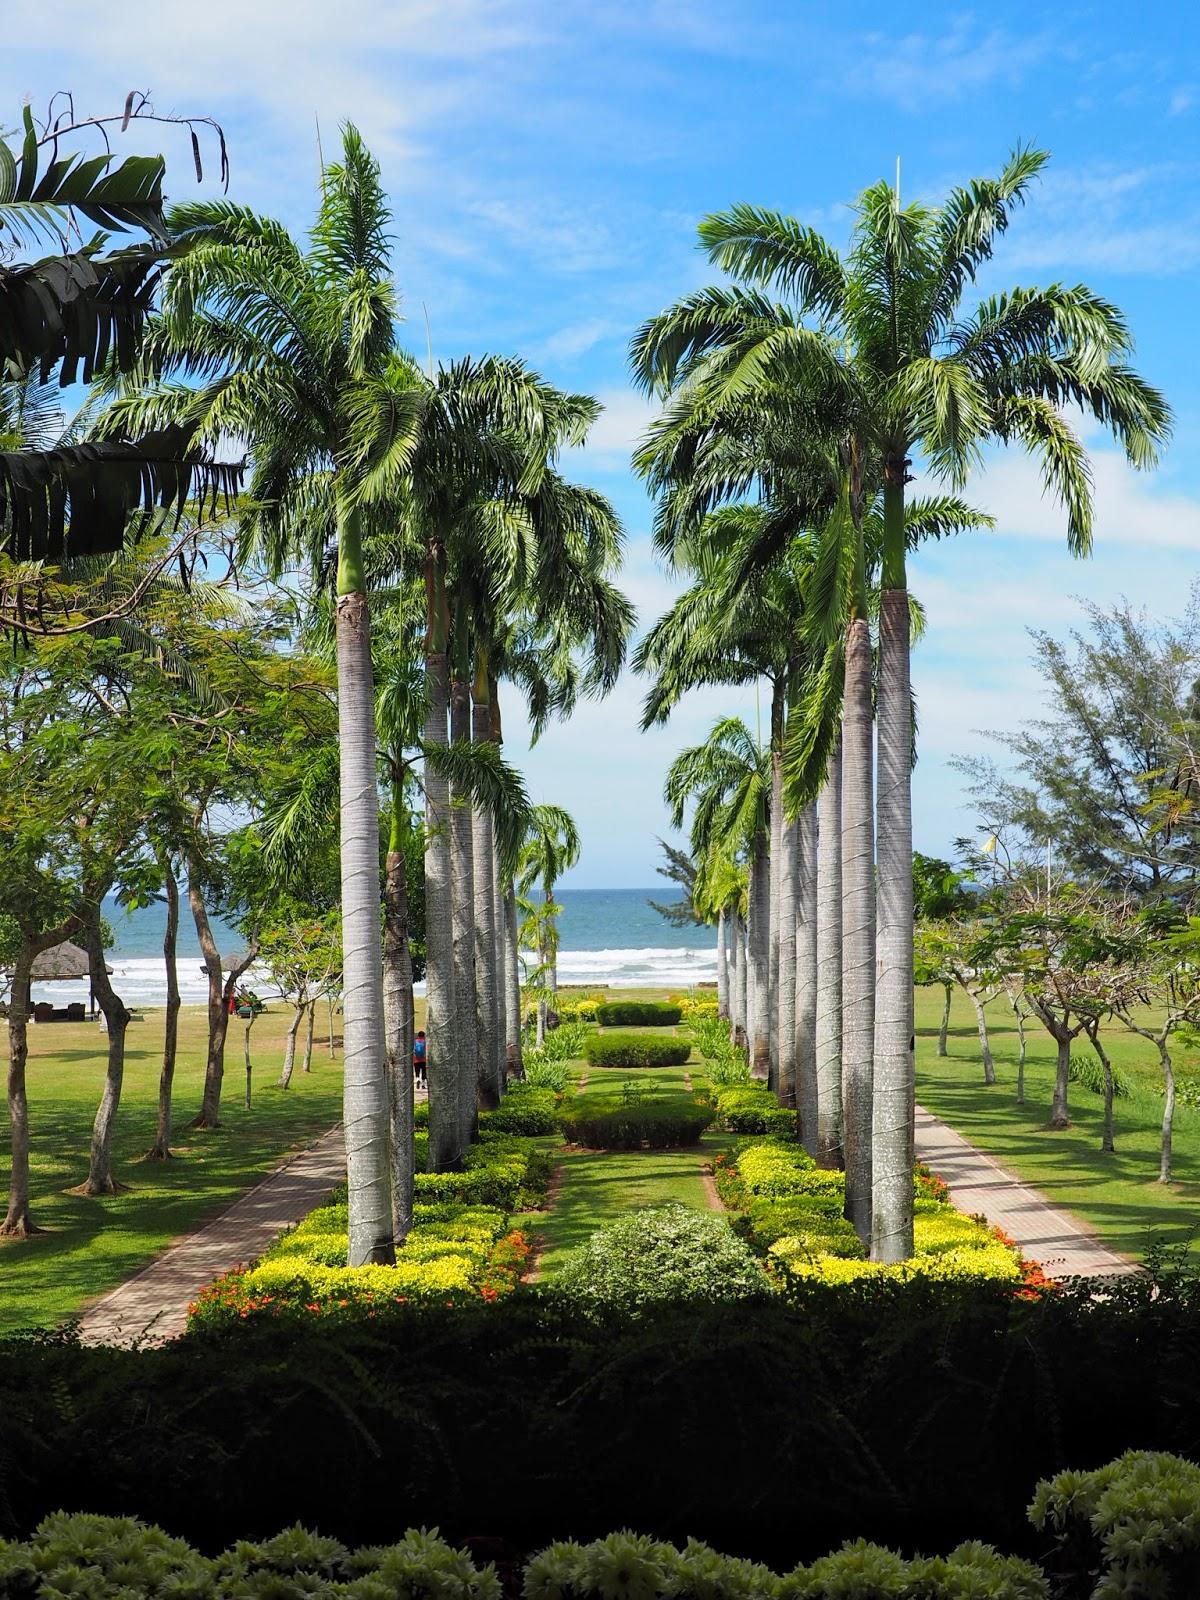 sabah kota kinabalu beach palm trees malaysia